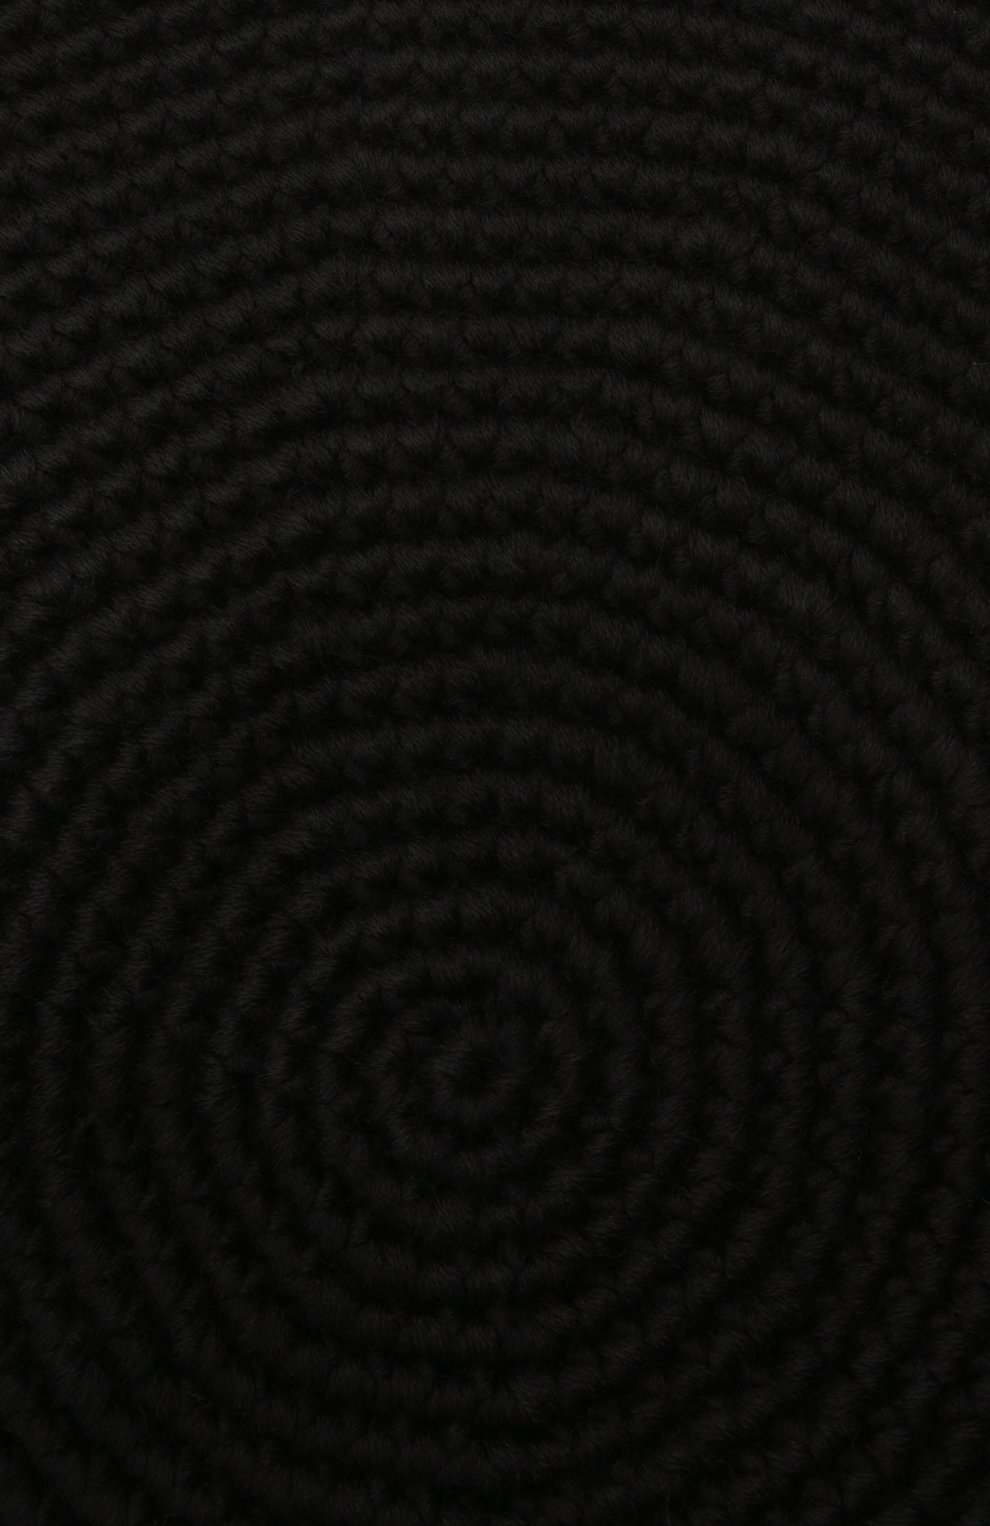 Женский берет LOW CLASSIC черного цвета, арт. L0W21FW_HA02BK | Фото 4 (Материал: Текстиль, Шерсть, Синтетический материал)